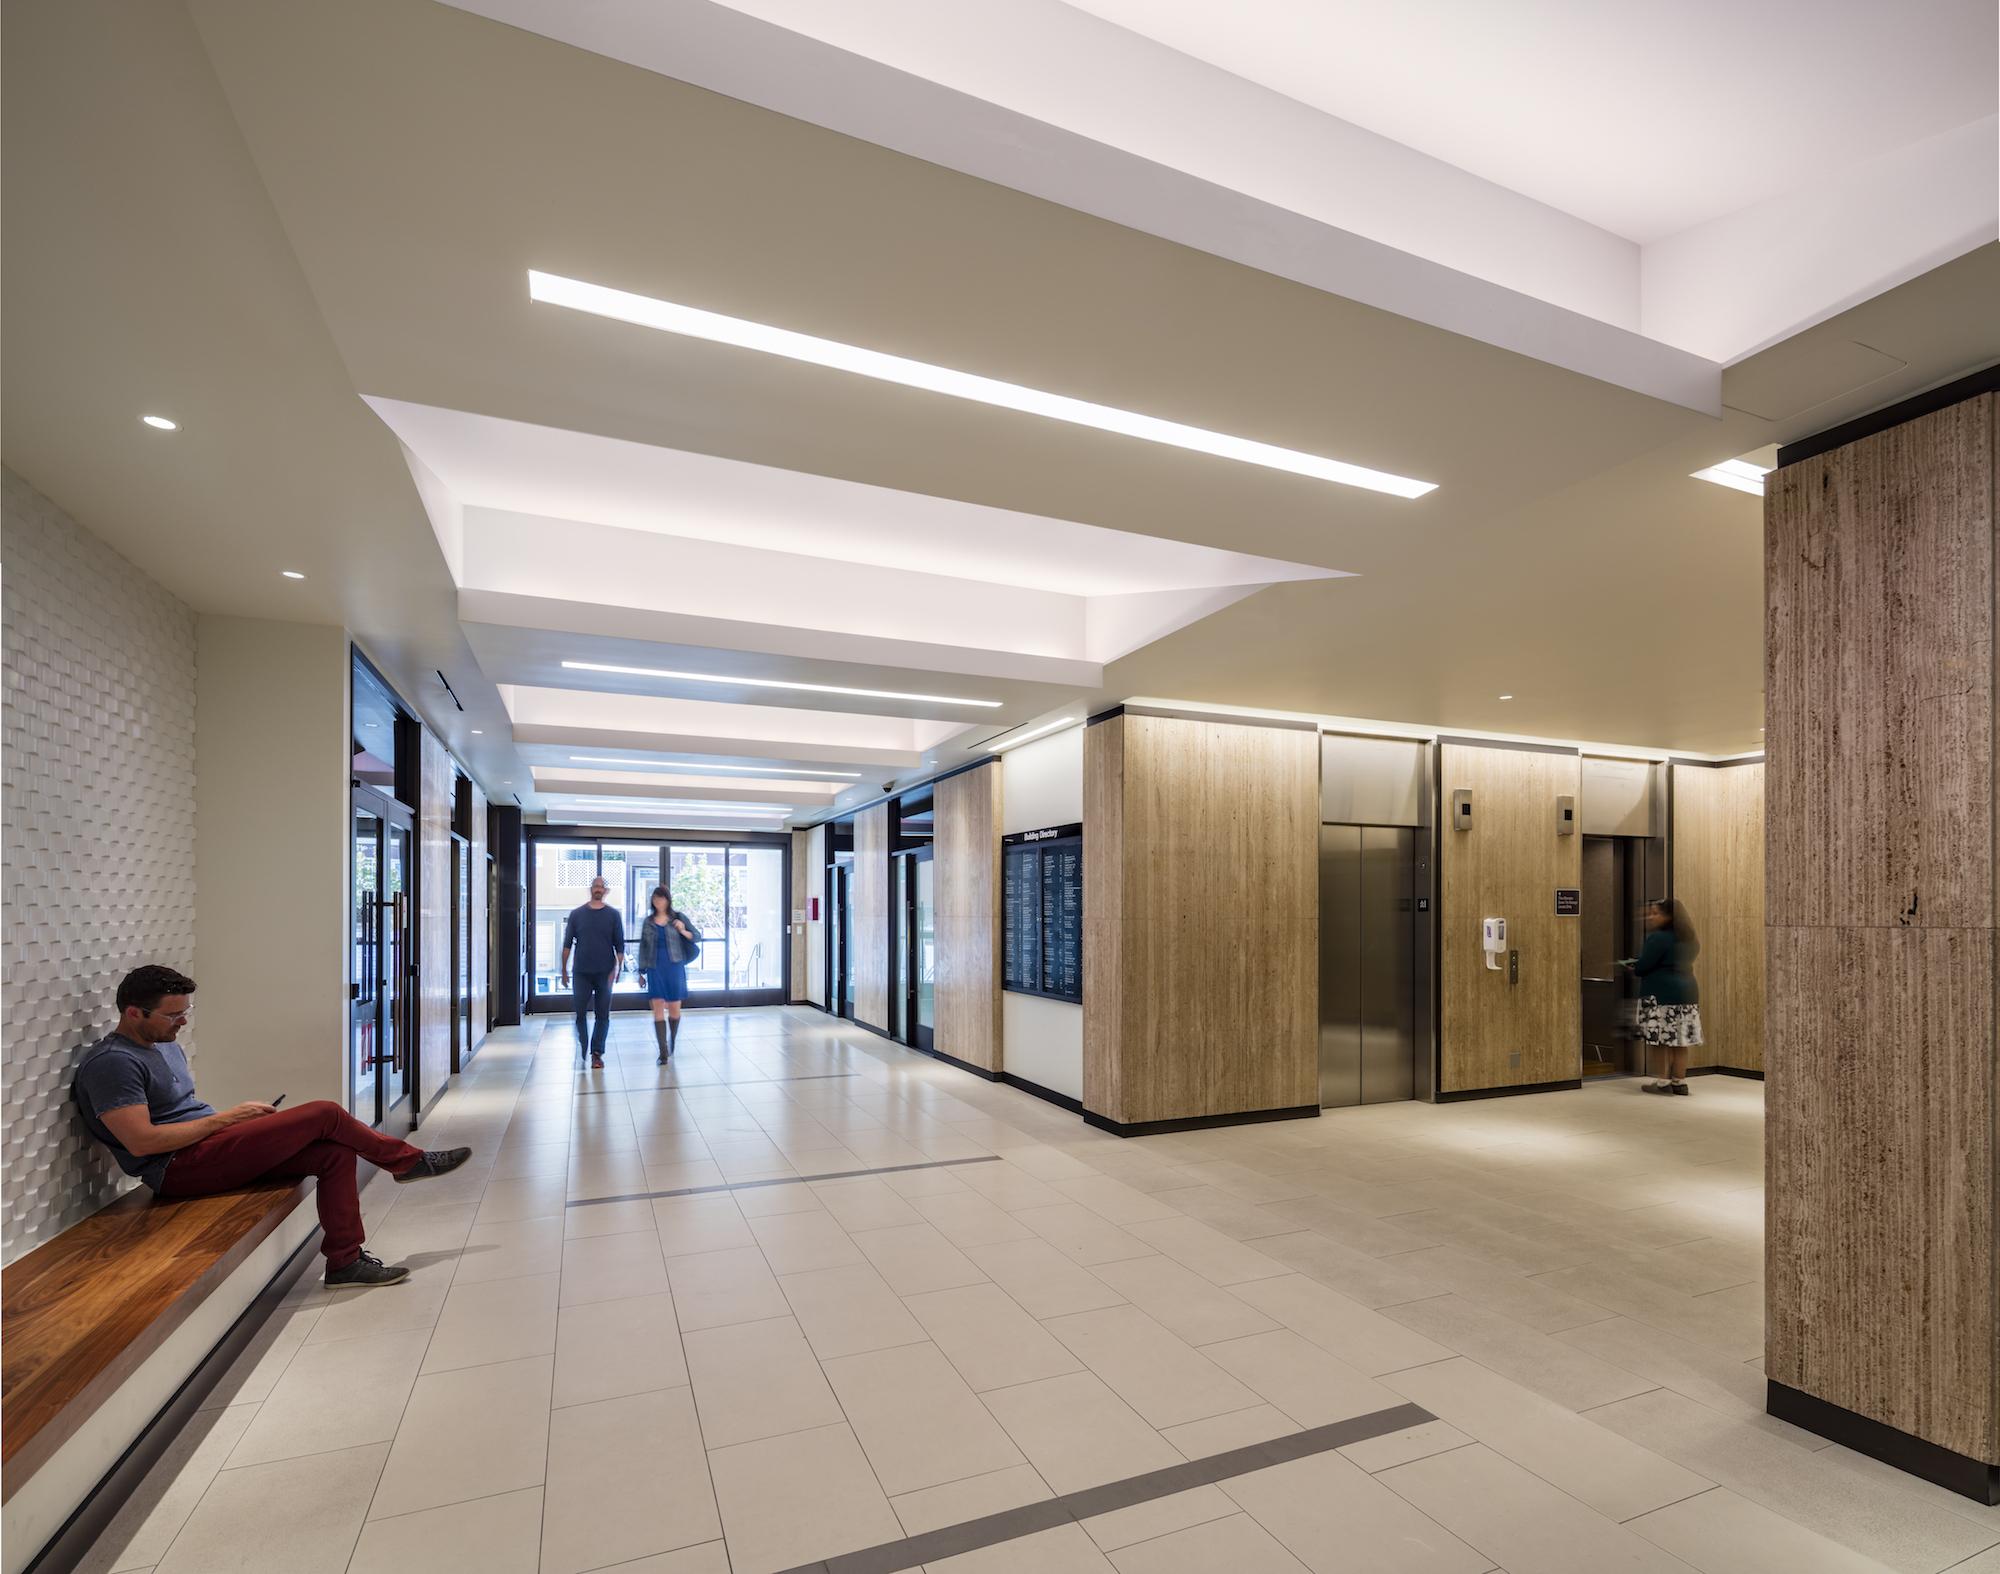 Hallway lobby lighting Summit Medical building renovation ©brick-inc